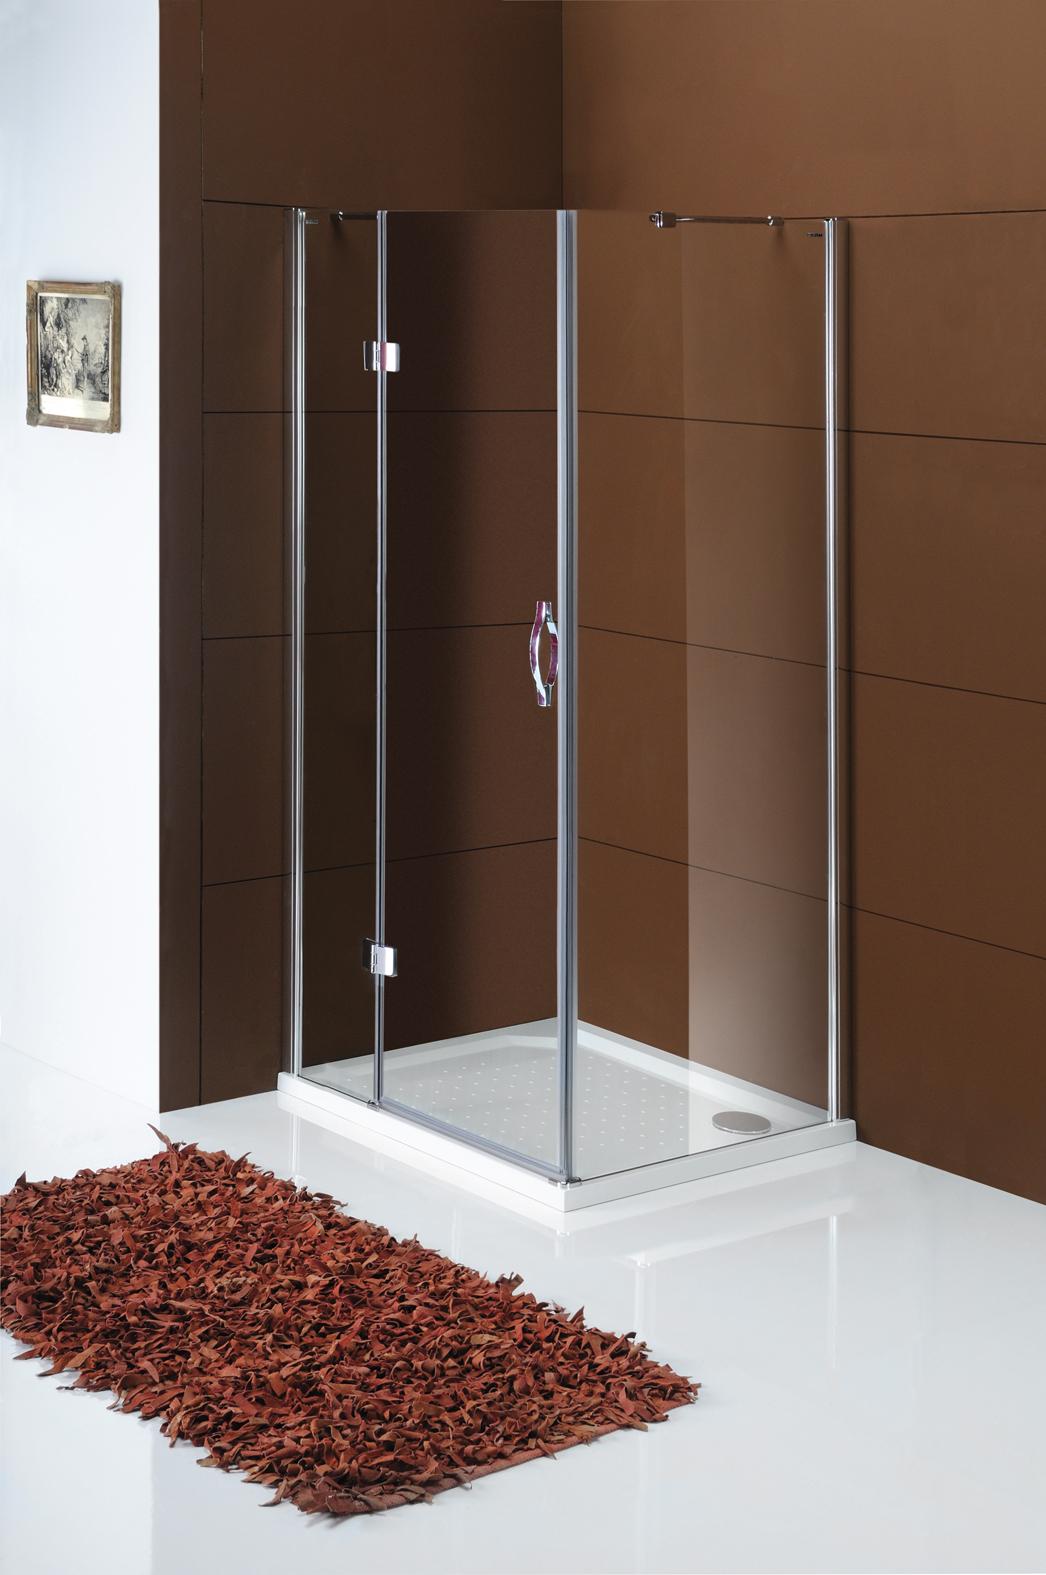 Gelco Sprchové dveře Legro jednodílné otočné 120 cm, sklo čiré/leštěný profil GL1112